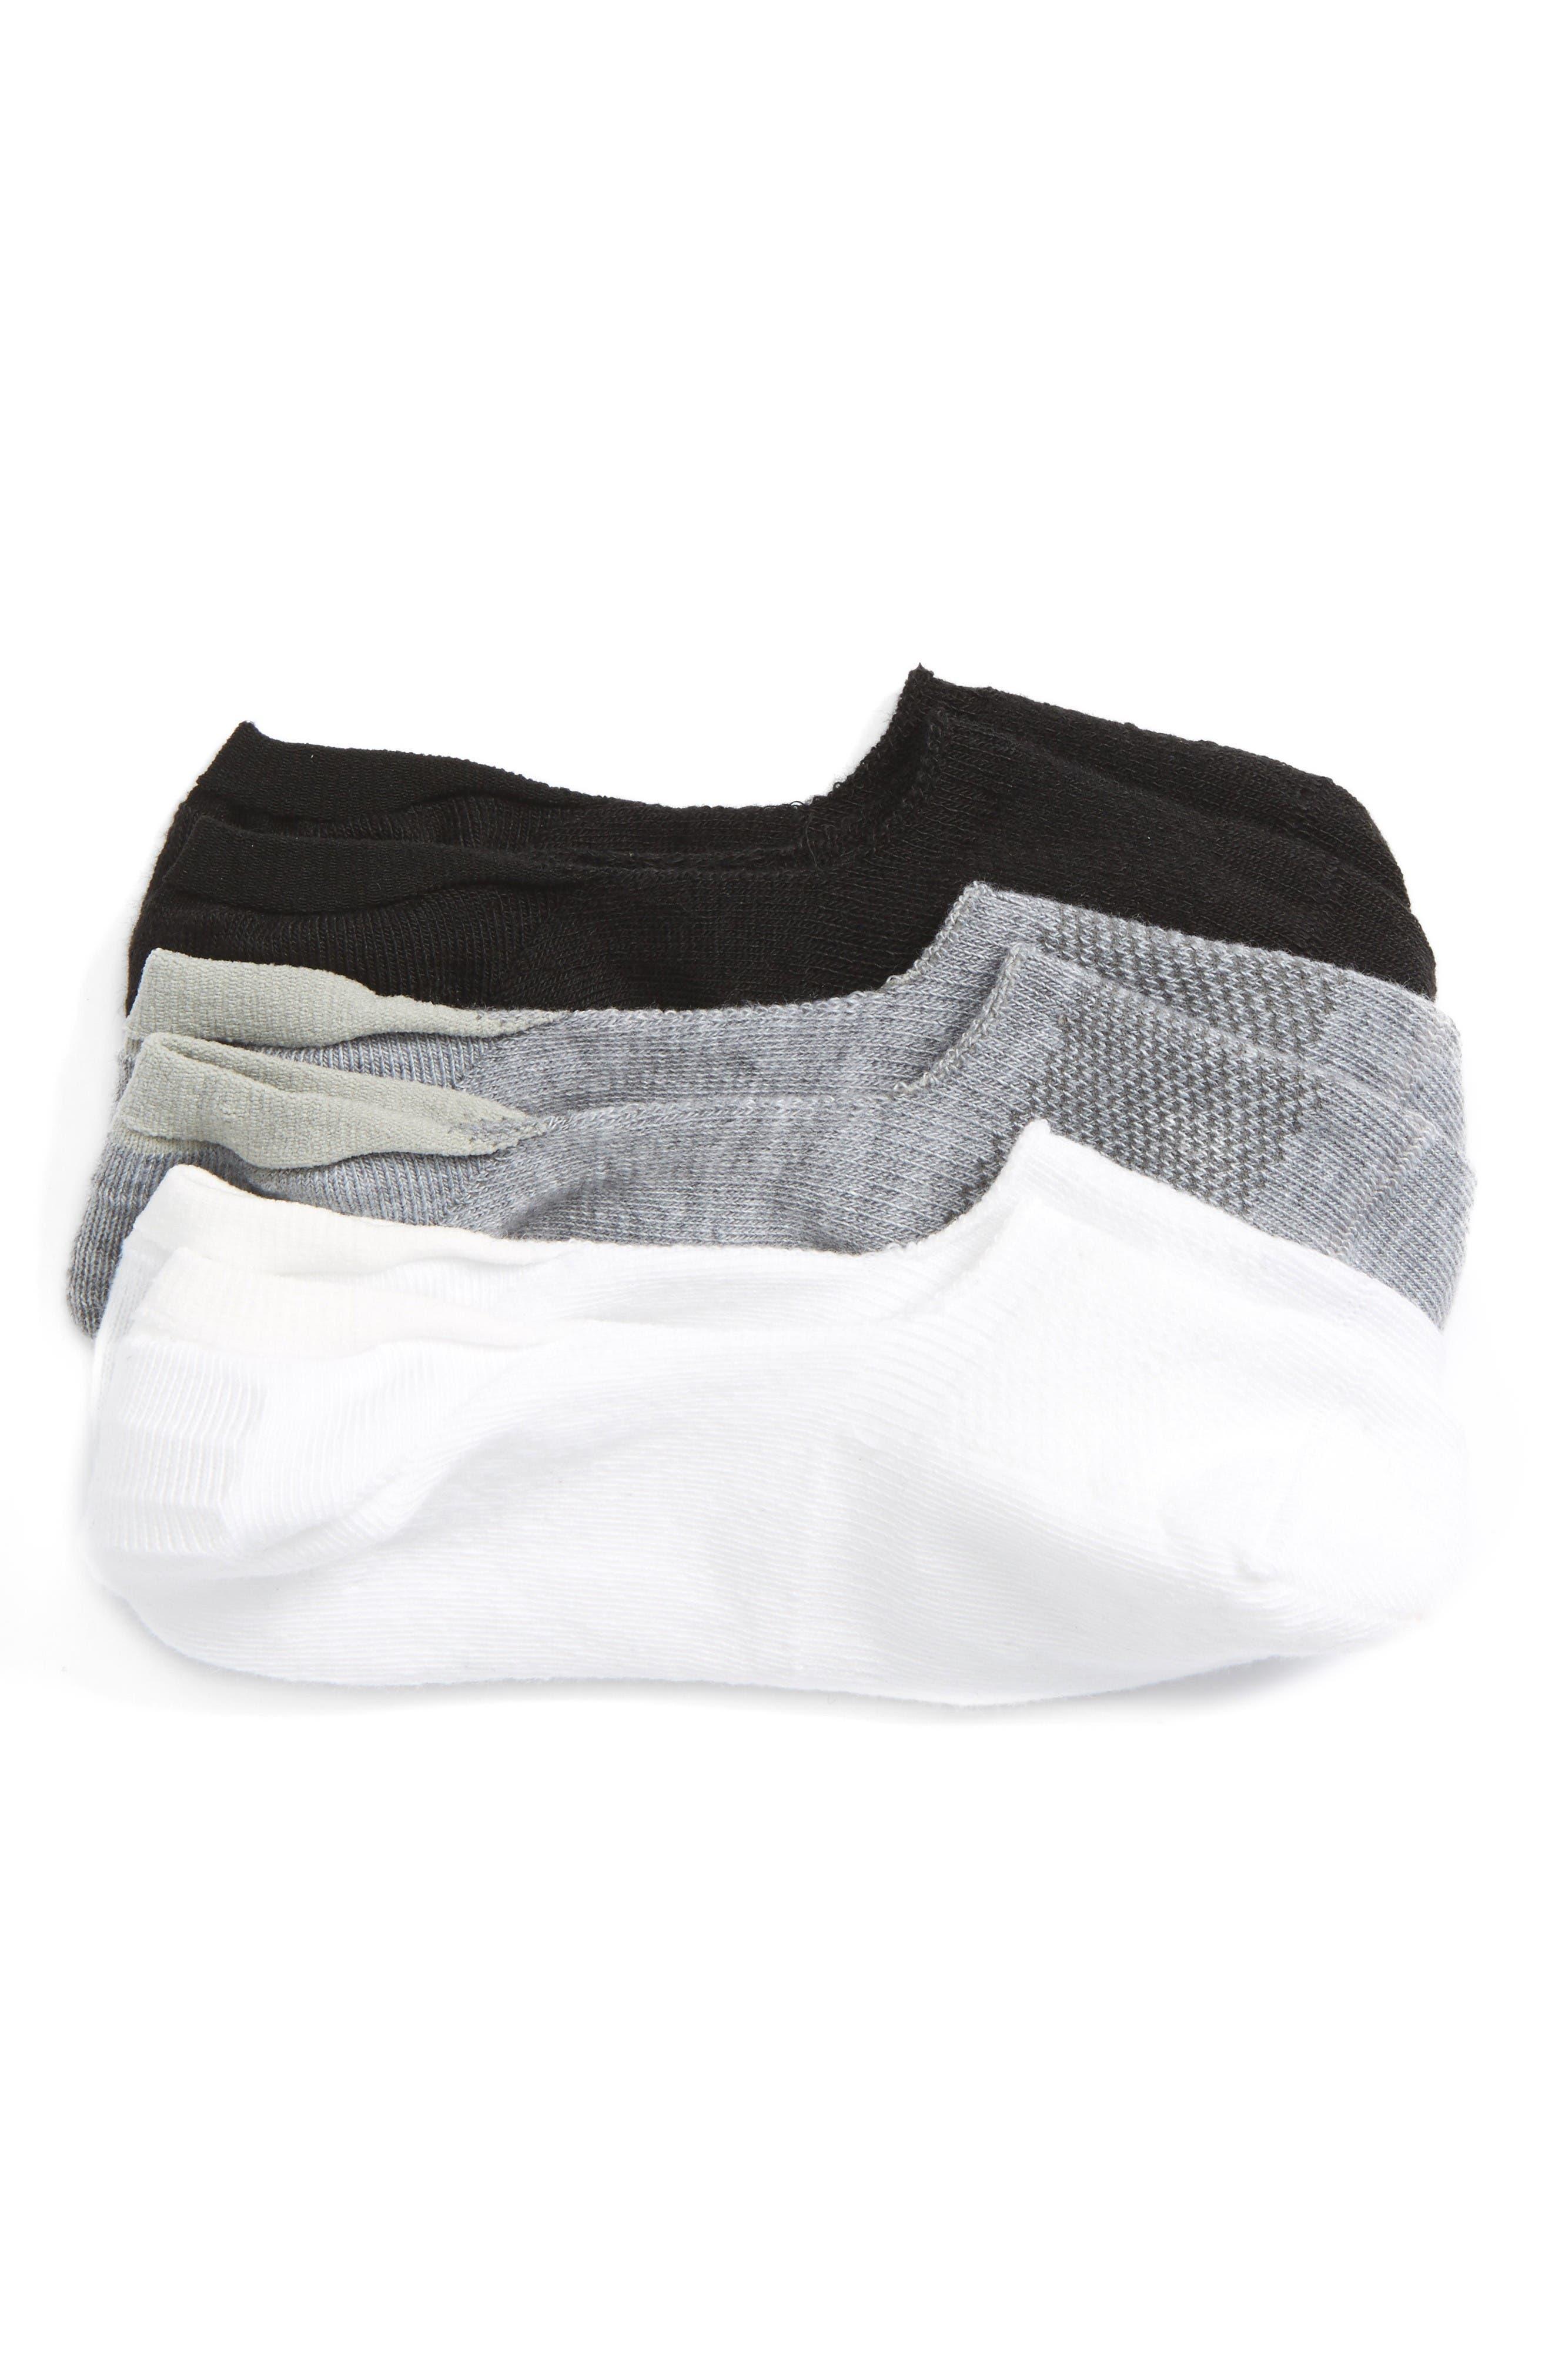 Main Image - Tucker + Tate Assorted 3-Pack Liner Socks (Walker, Toddler, Little Kid & Big Kid)